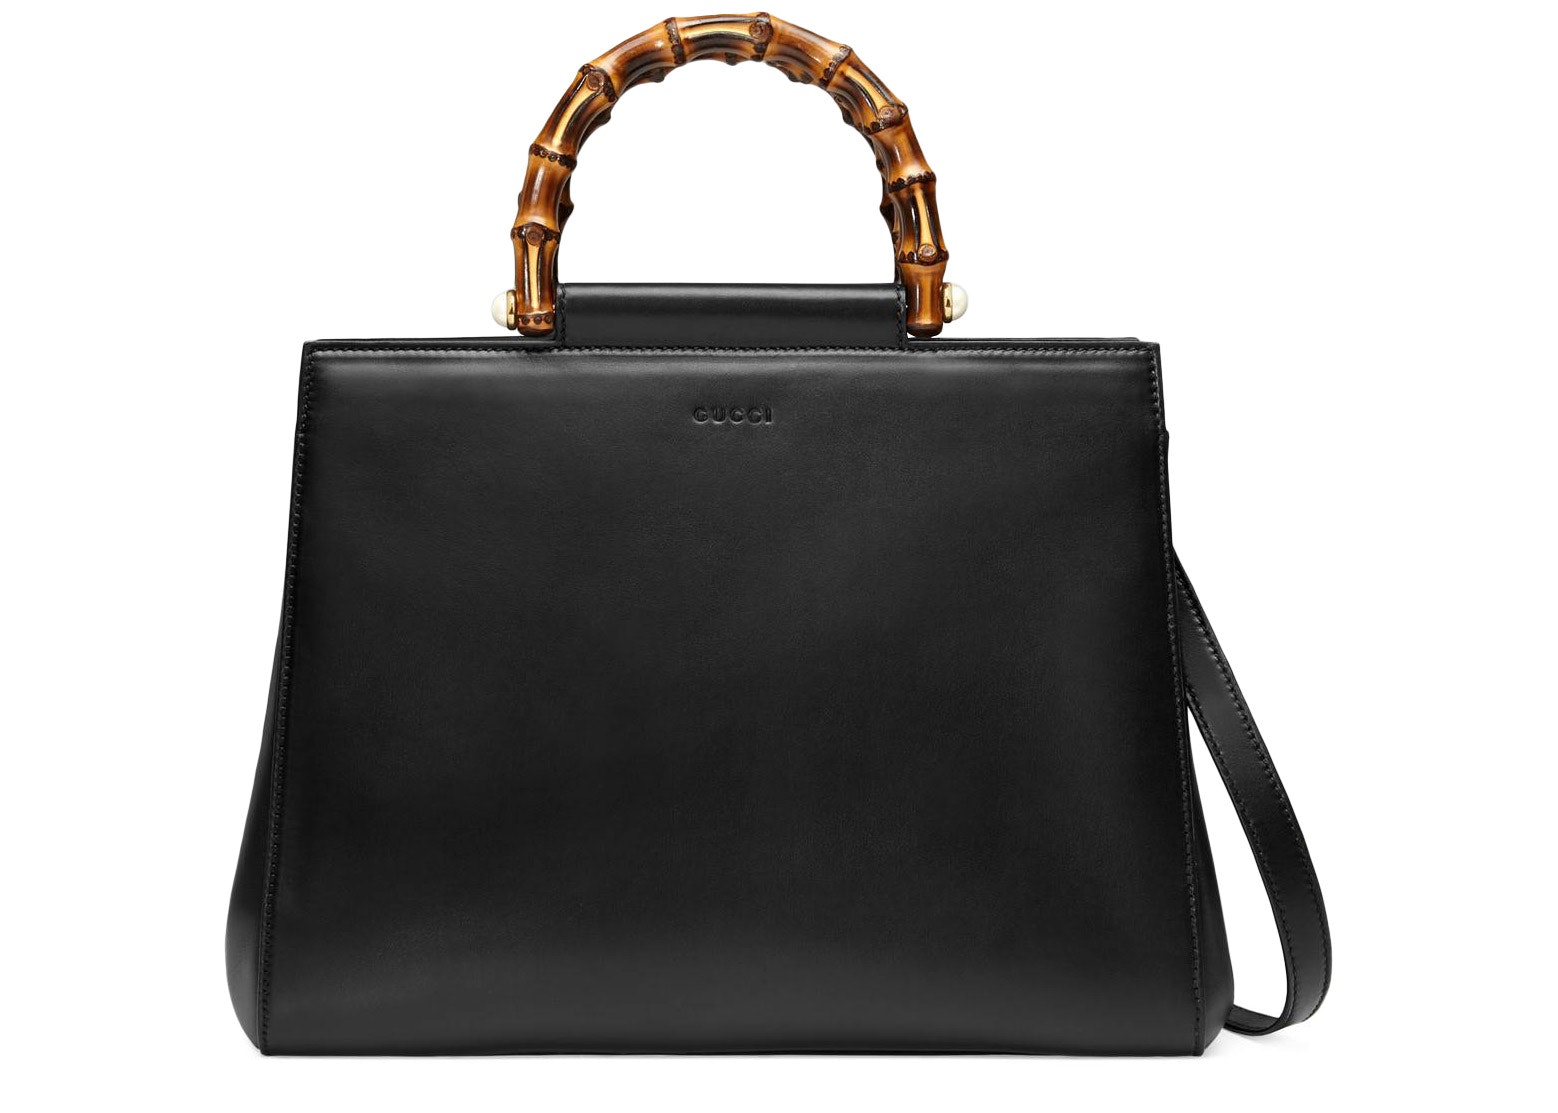 Gucci Bamboo Nymphaea Top Handle Medium Black